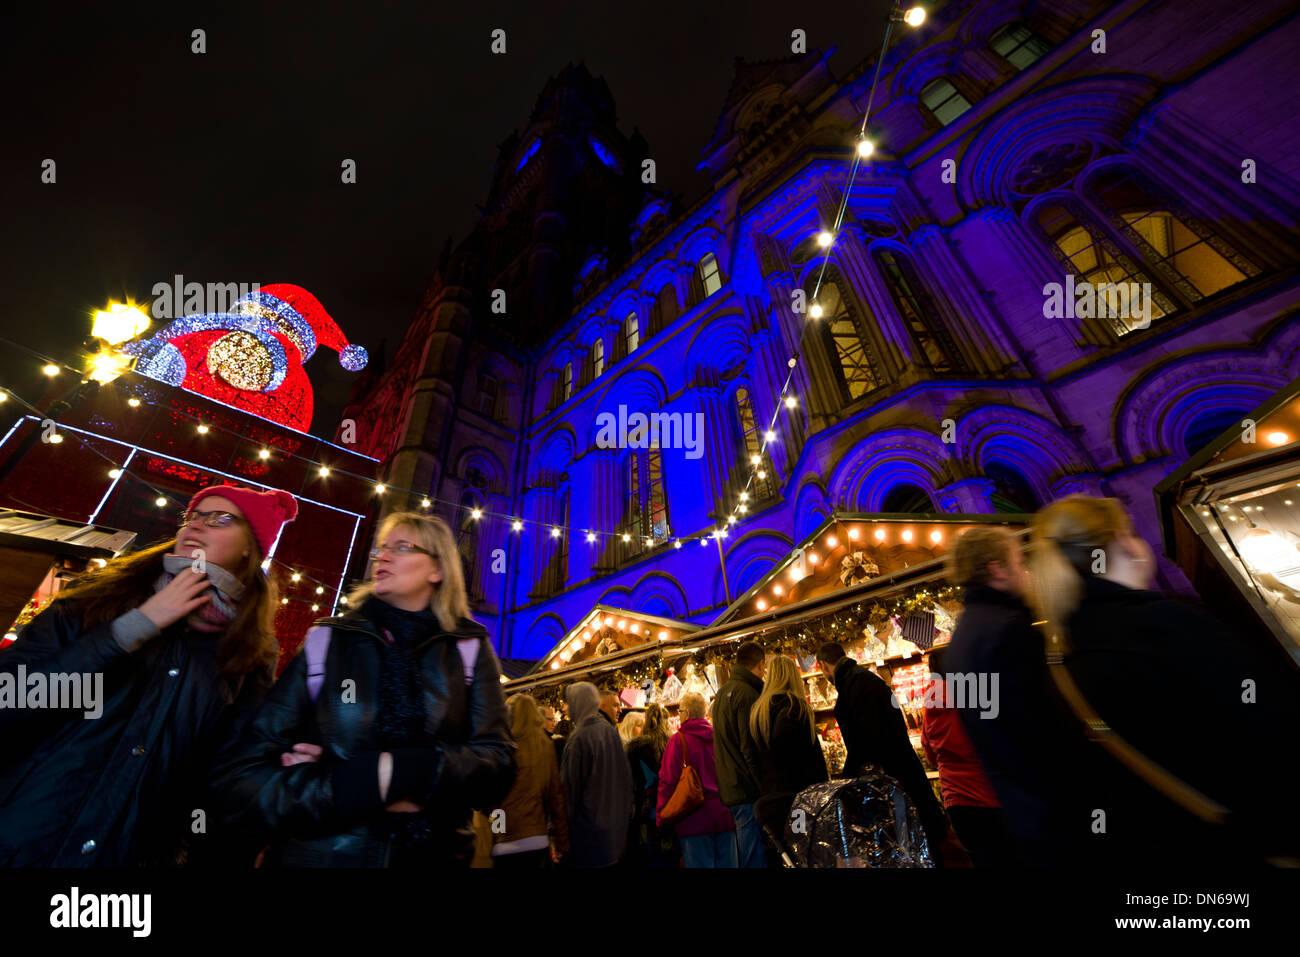 Manchester Christmas market, stall, bottle stoppers, 2013, night, European, German, Italian, winter, December, England, EU - Stock Image